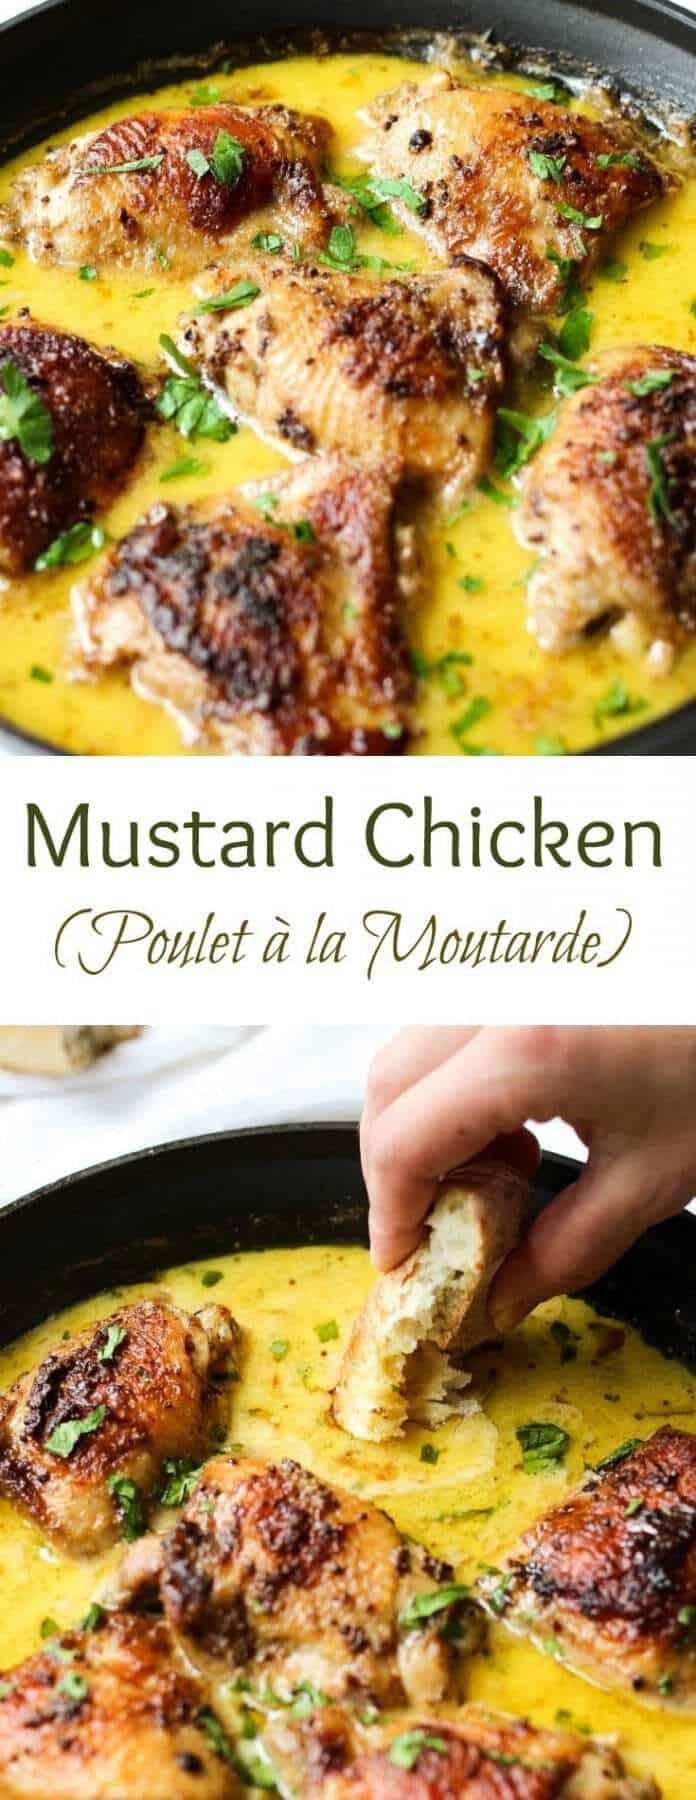 Creamy Dijon Mustard Chicken